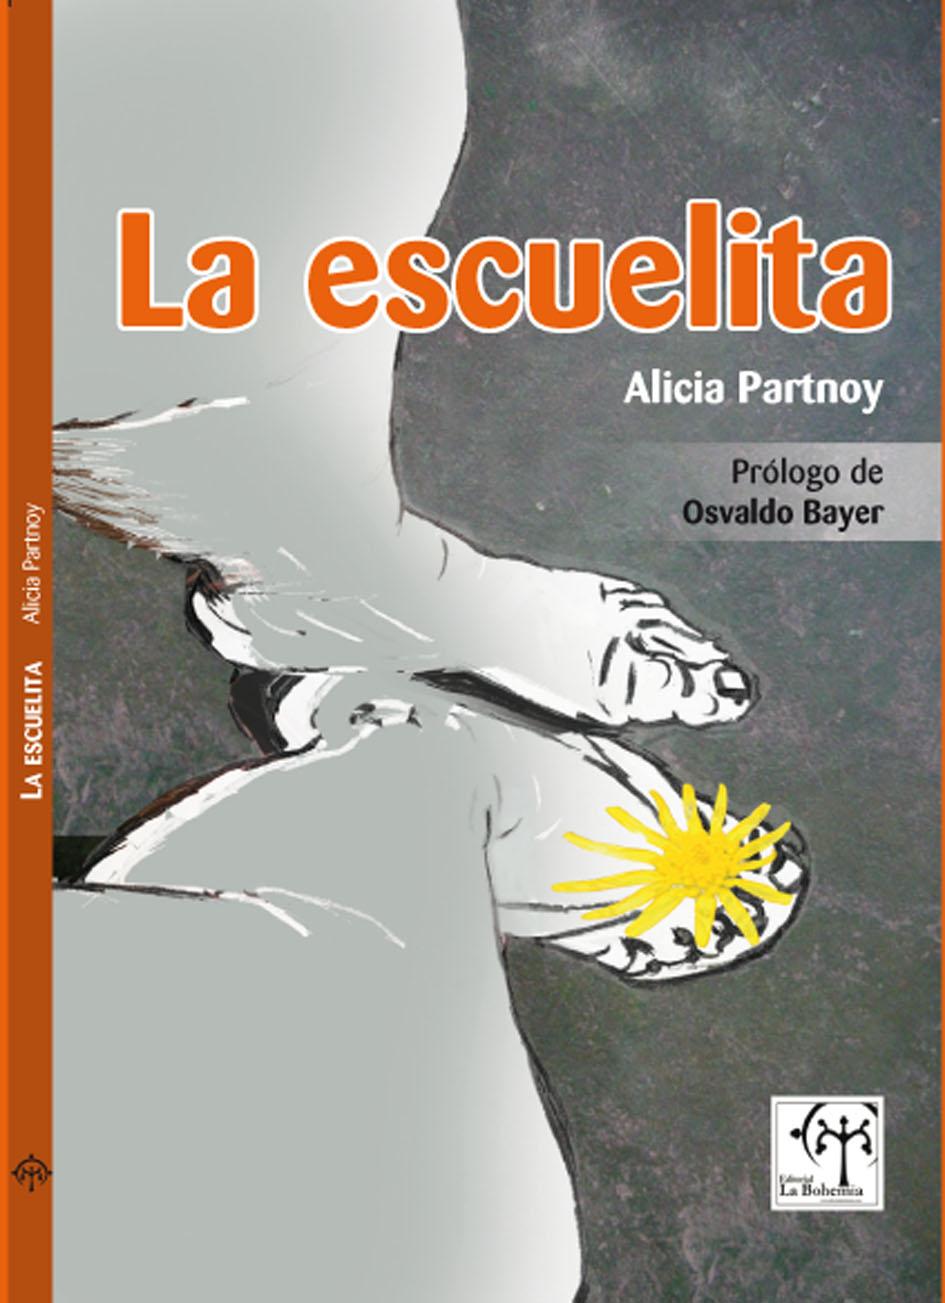 libro de Alicia Partnoy